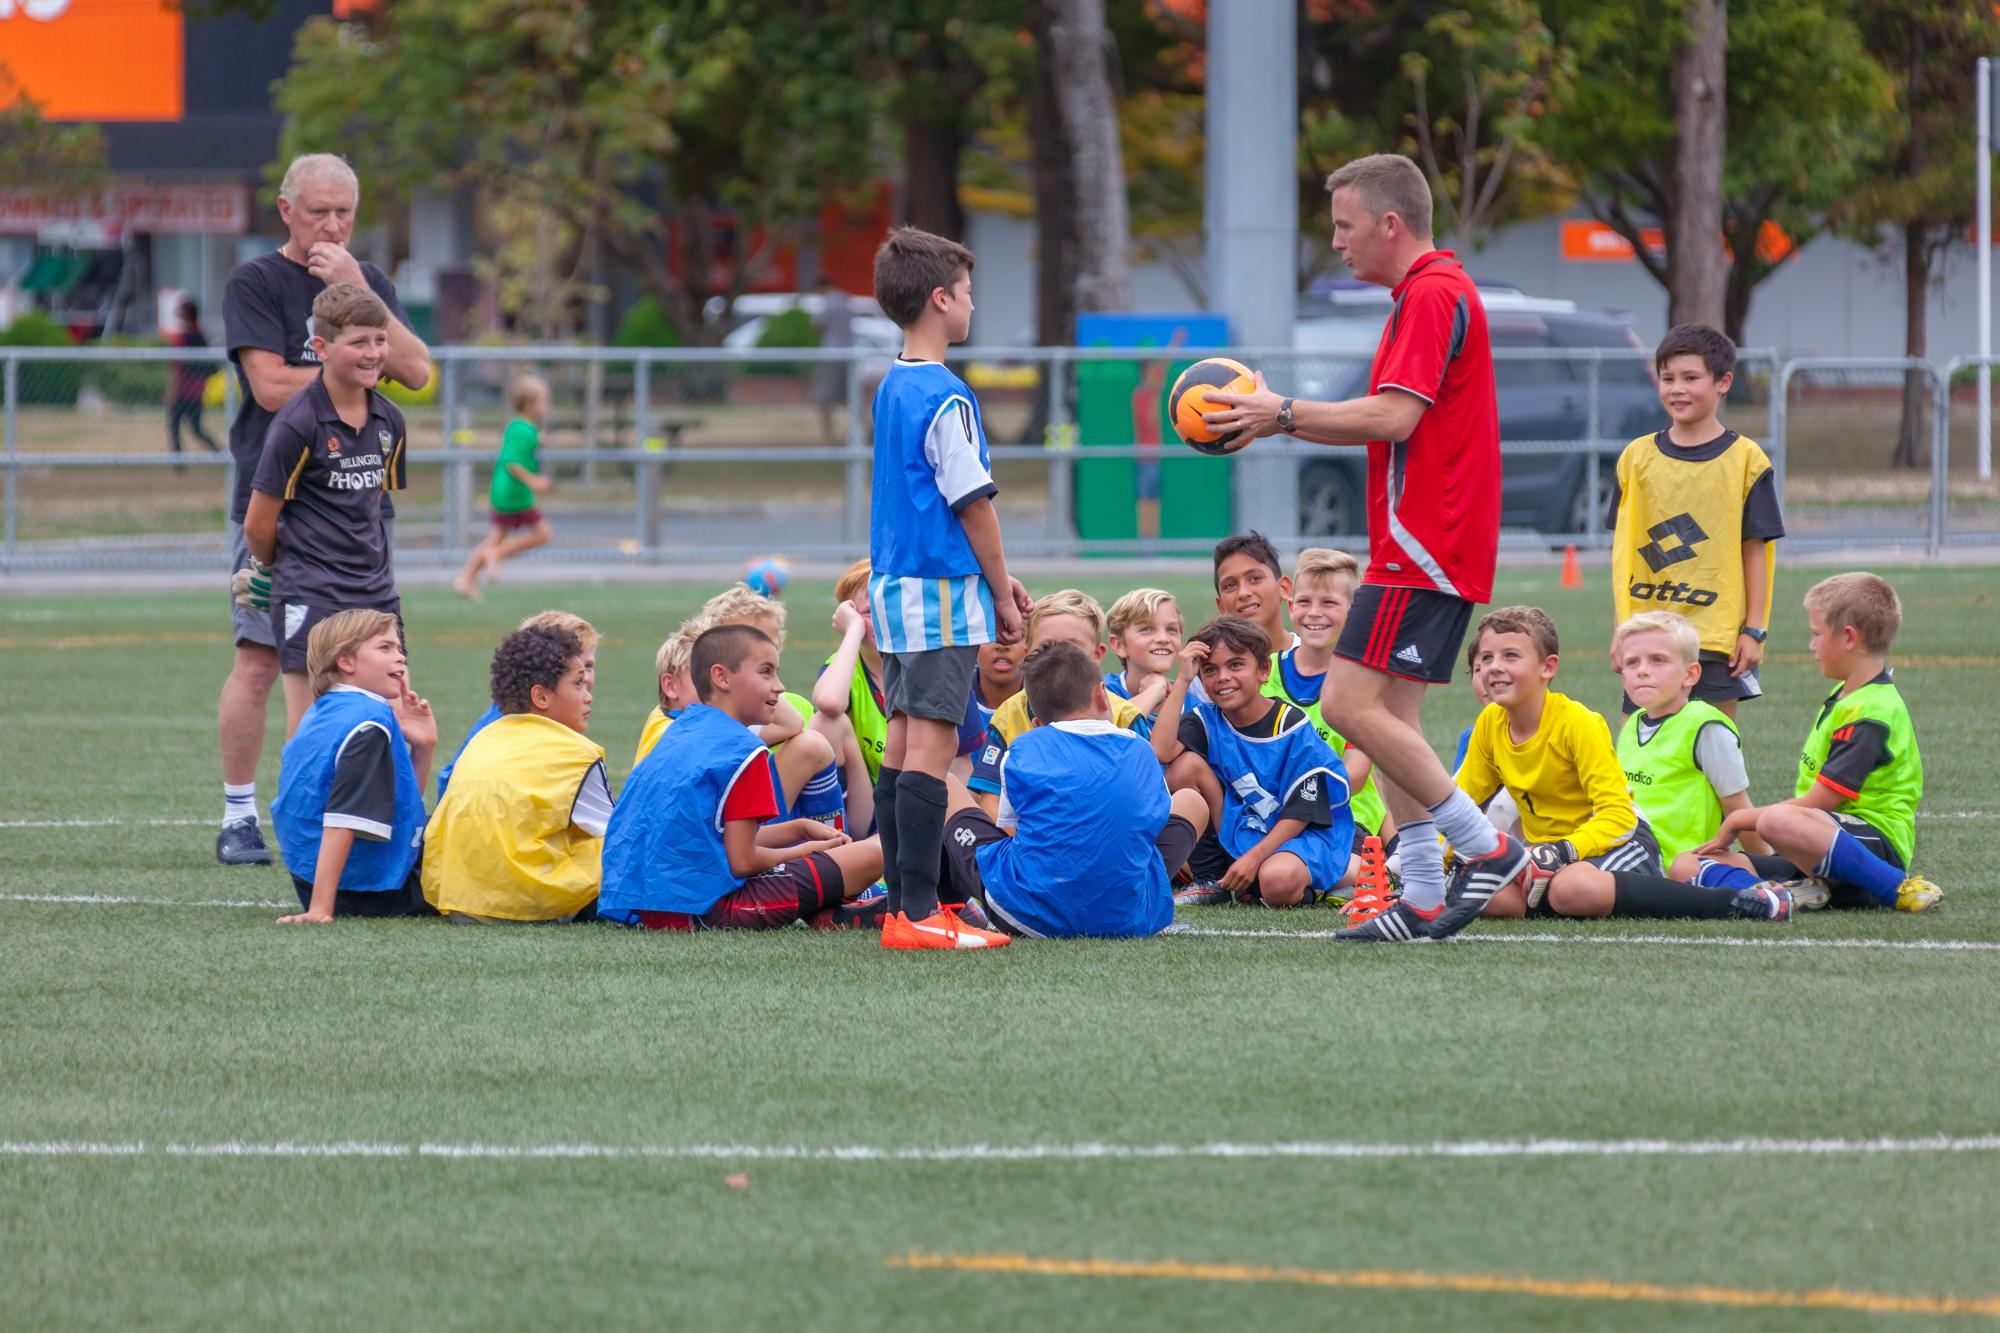 UHCC Soccer Coach 4489